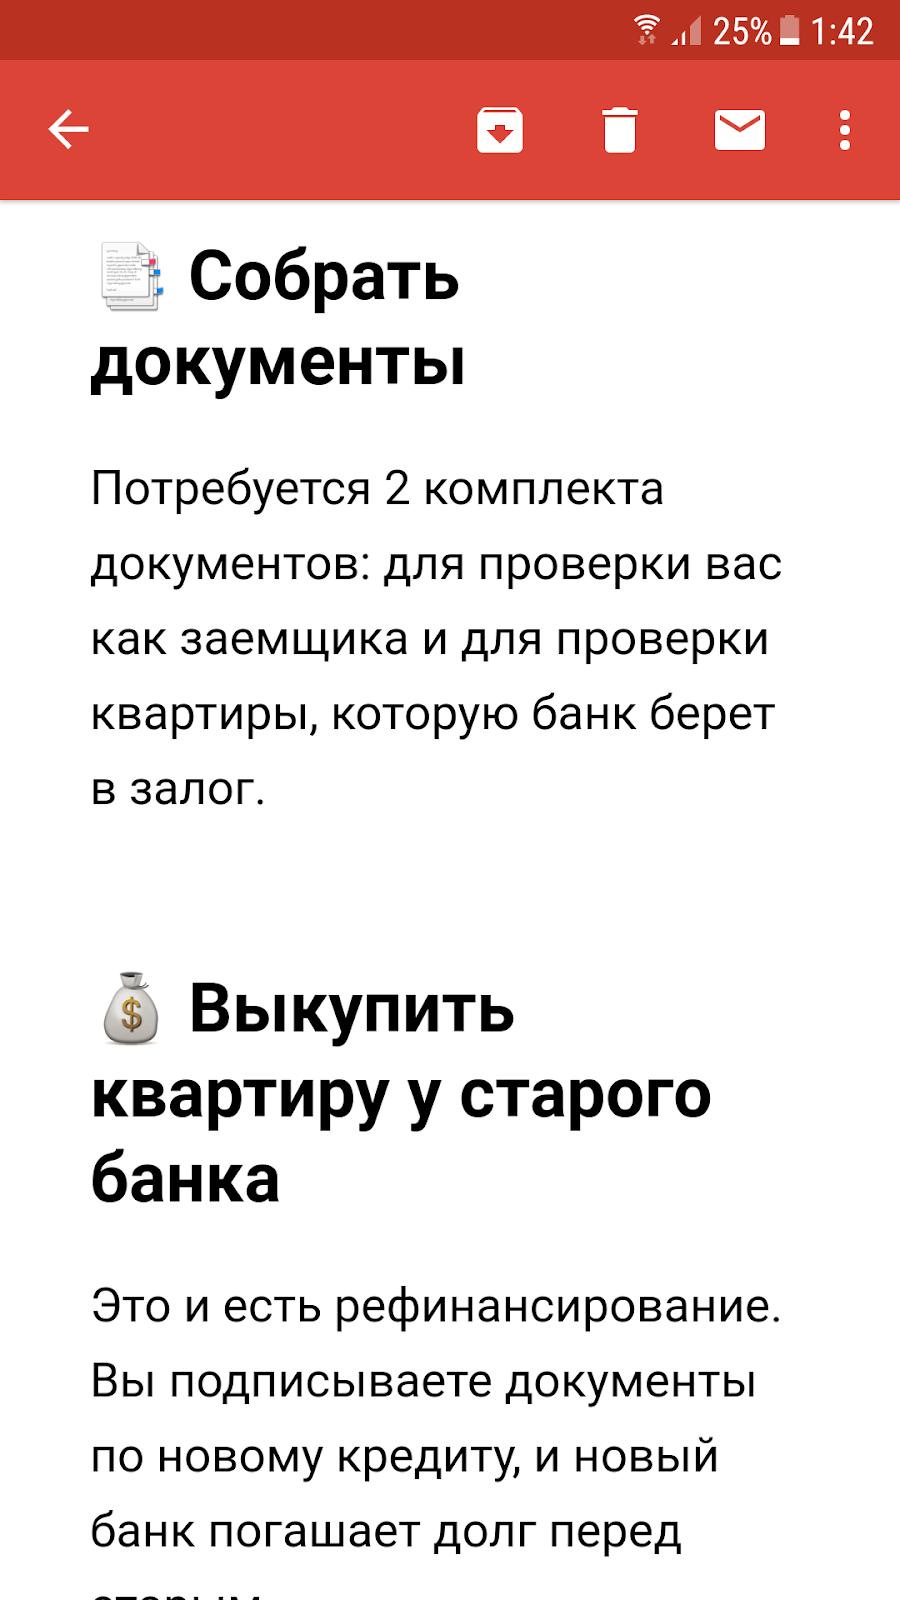 письмо с эмодзи на Android